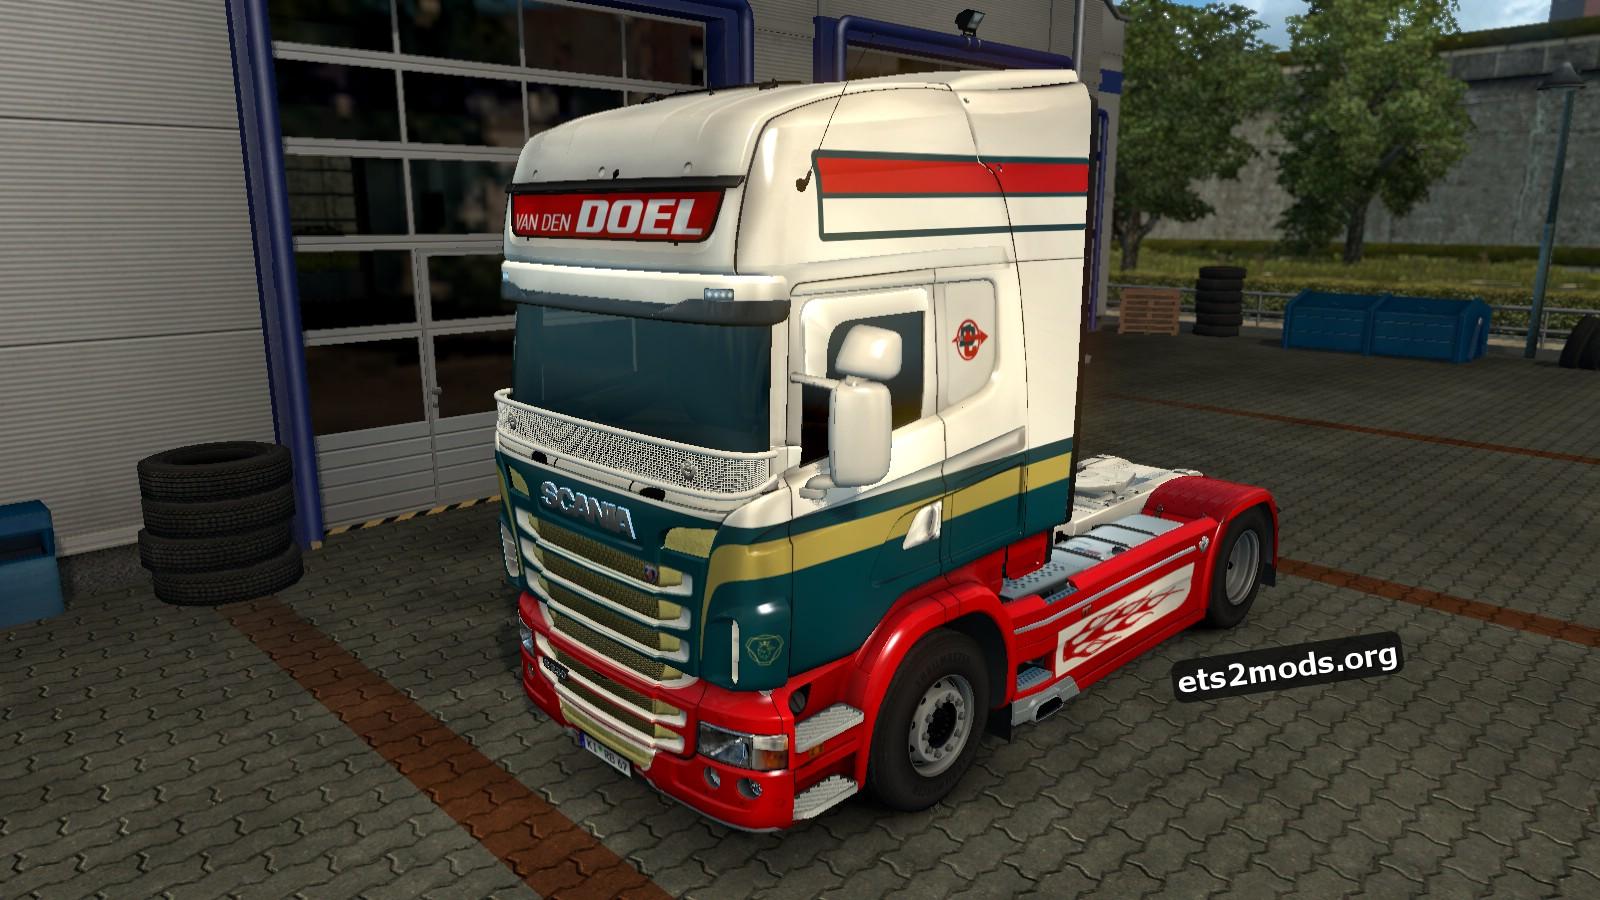 Scania RJL Van den Doel Int. Transport Skin